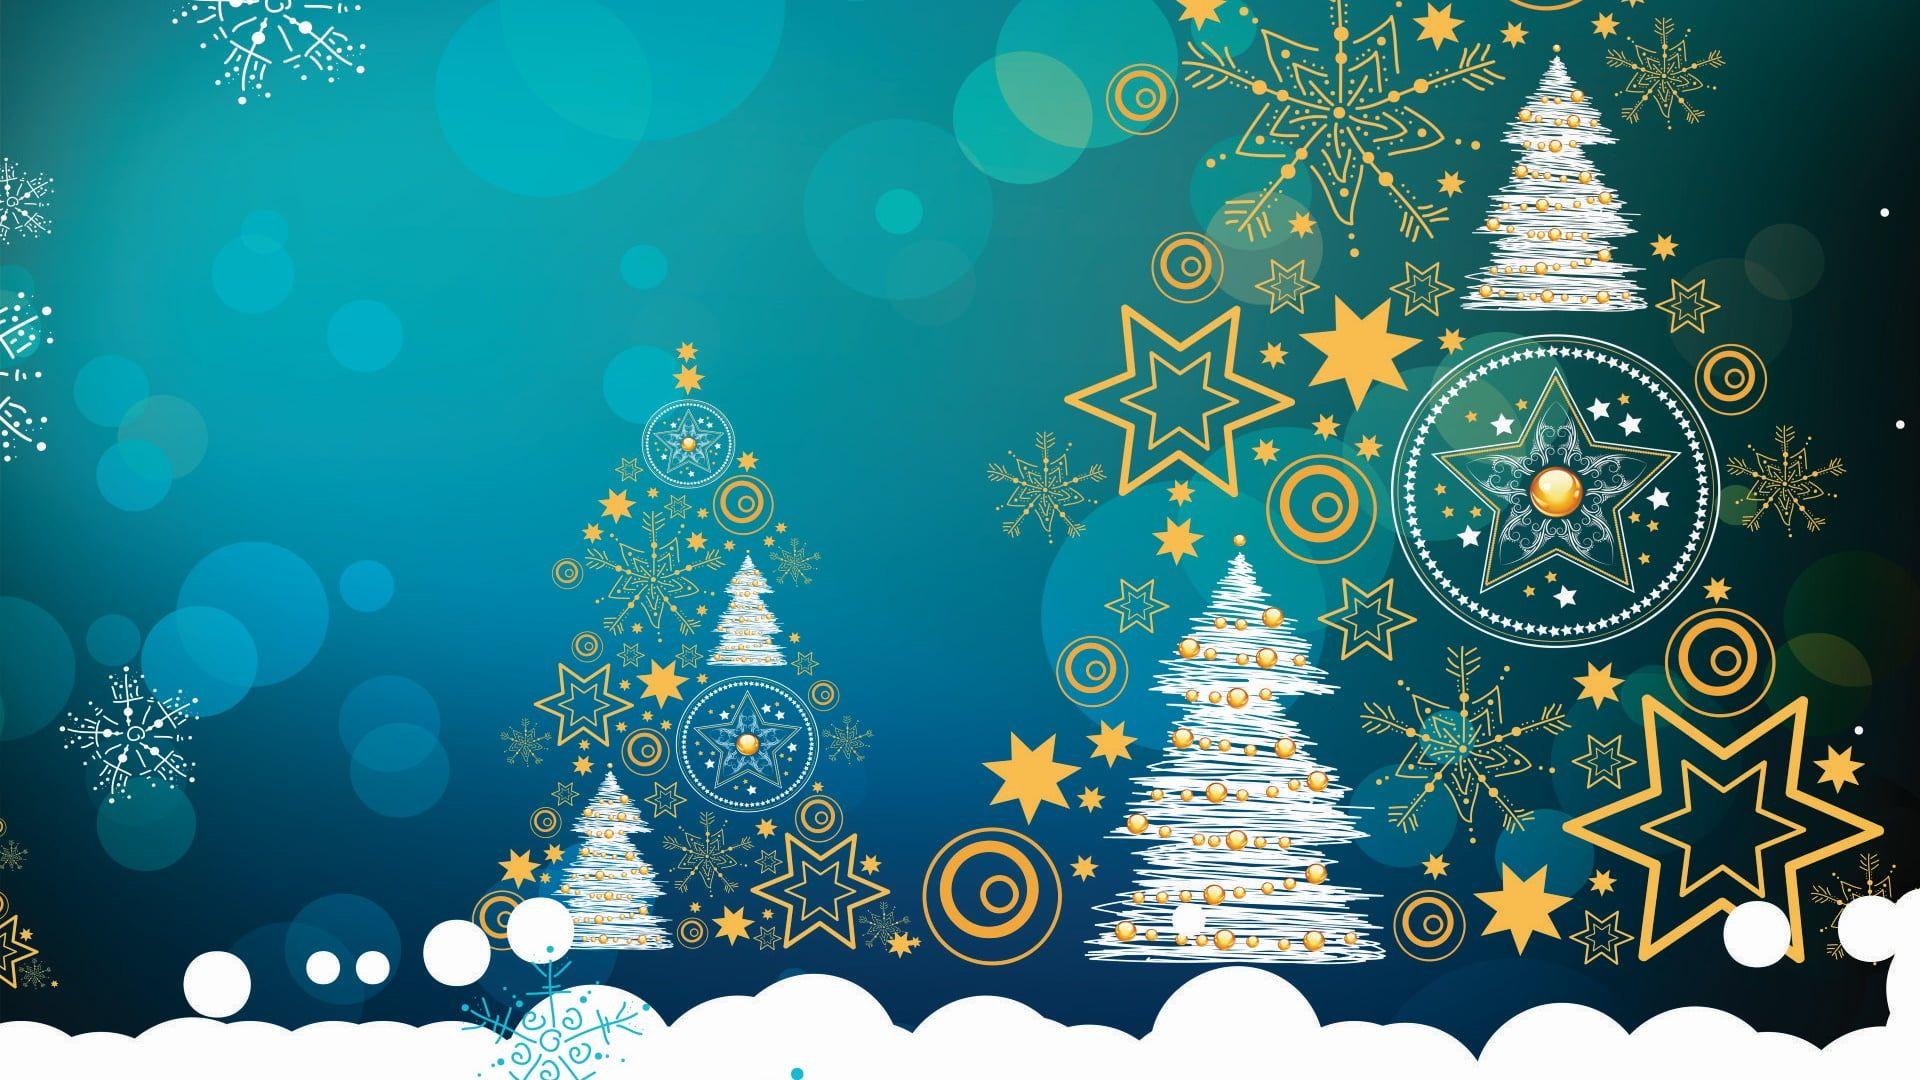 Christmas Christmas Tree Graphic Design Graphics Illustration 1080p Wallpaper Hdwallpaper Pink Abstract Painting Digital Wallpaper Christmas Tree Graphic